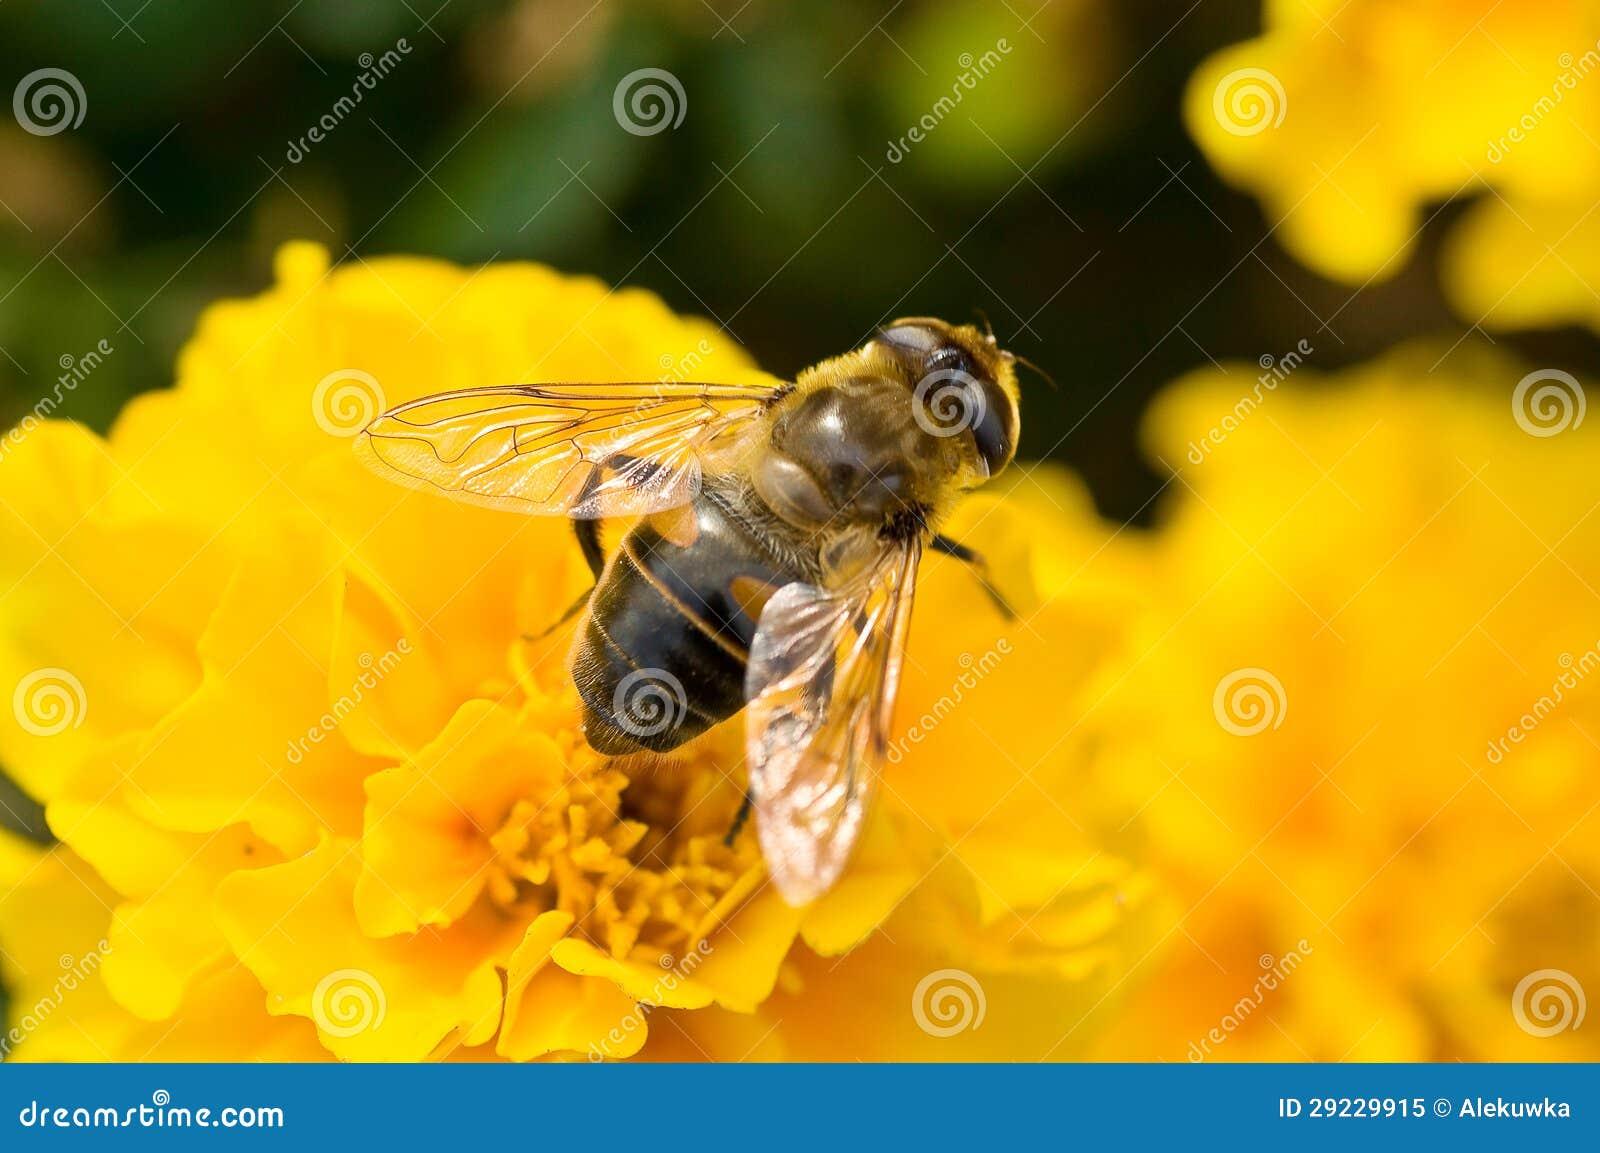 Download Flor da mola imagem de stock. Imagem de zumbido, pés - 29229915